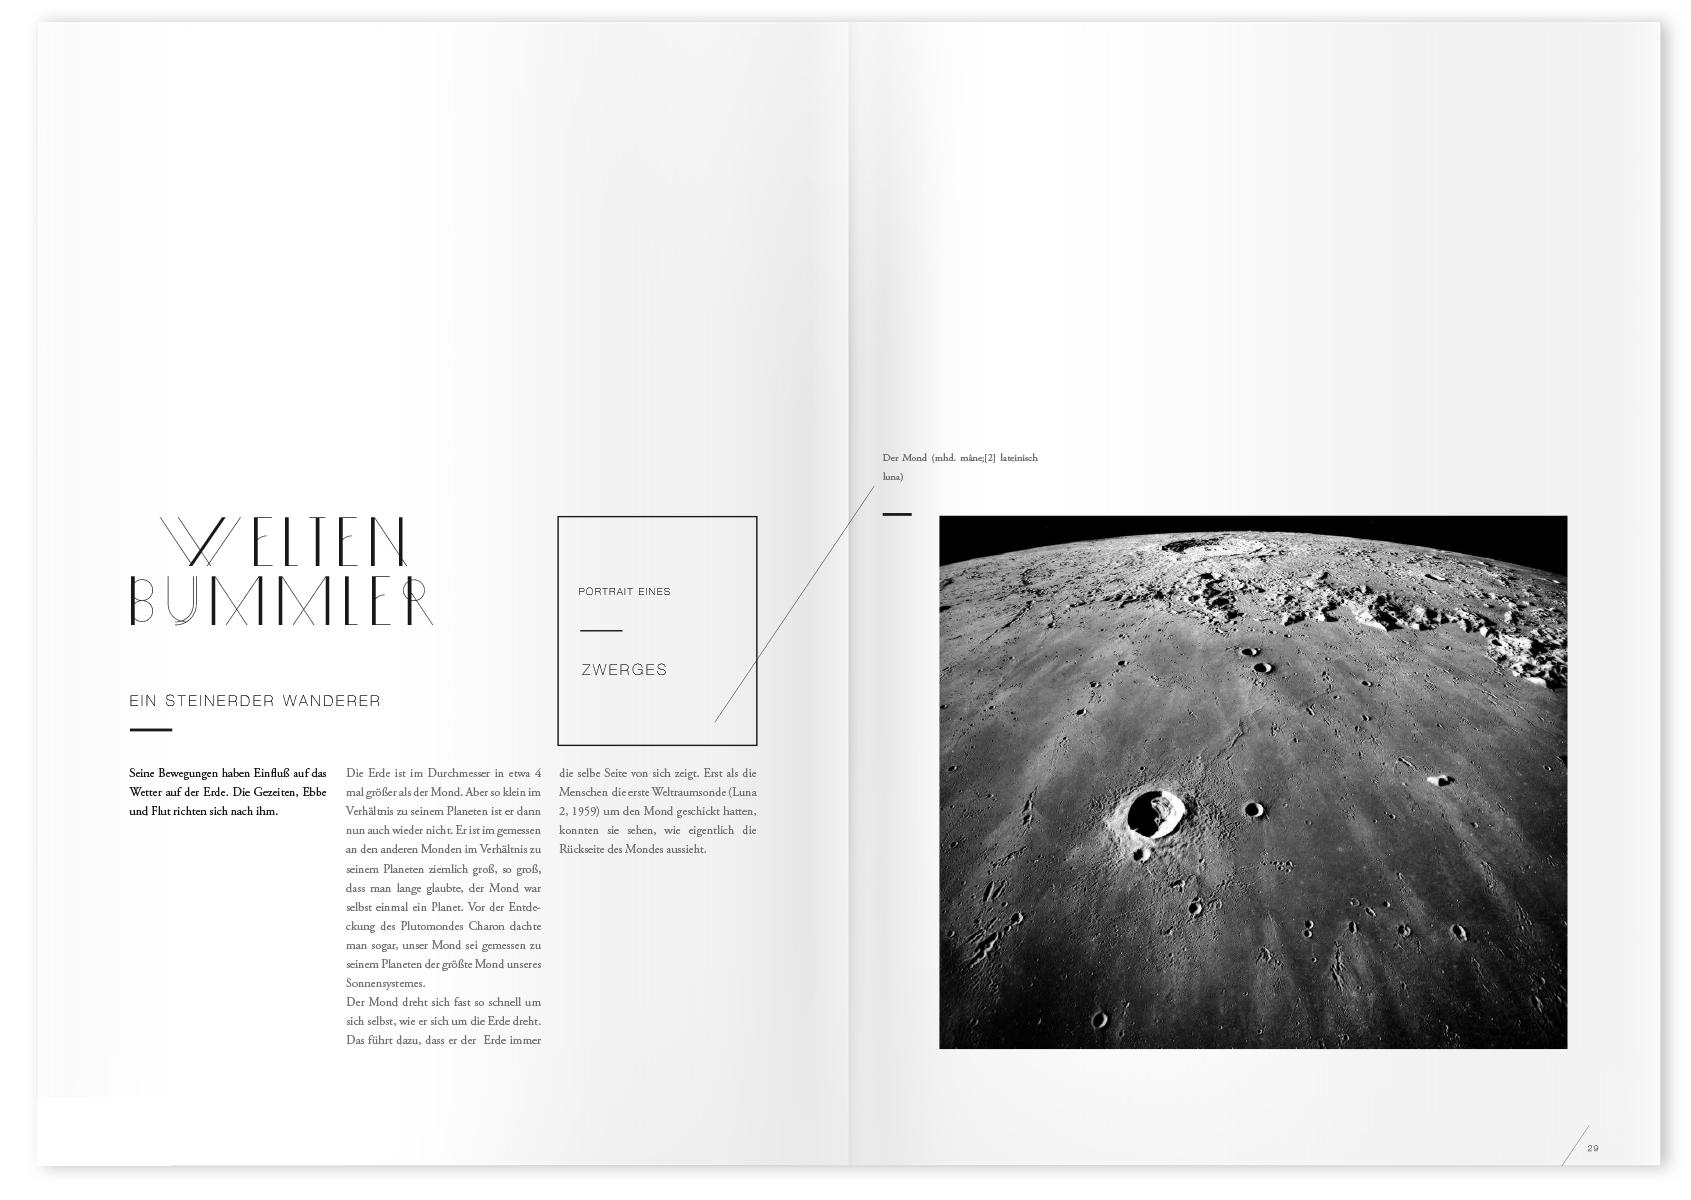 05_Cosmos-Magazin_hsrm-Hochschule-RheinMain_Editorial-Design_Grafikdesign_Gloria-Kison.jpg